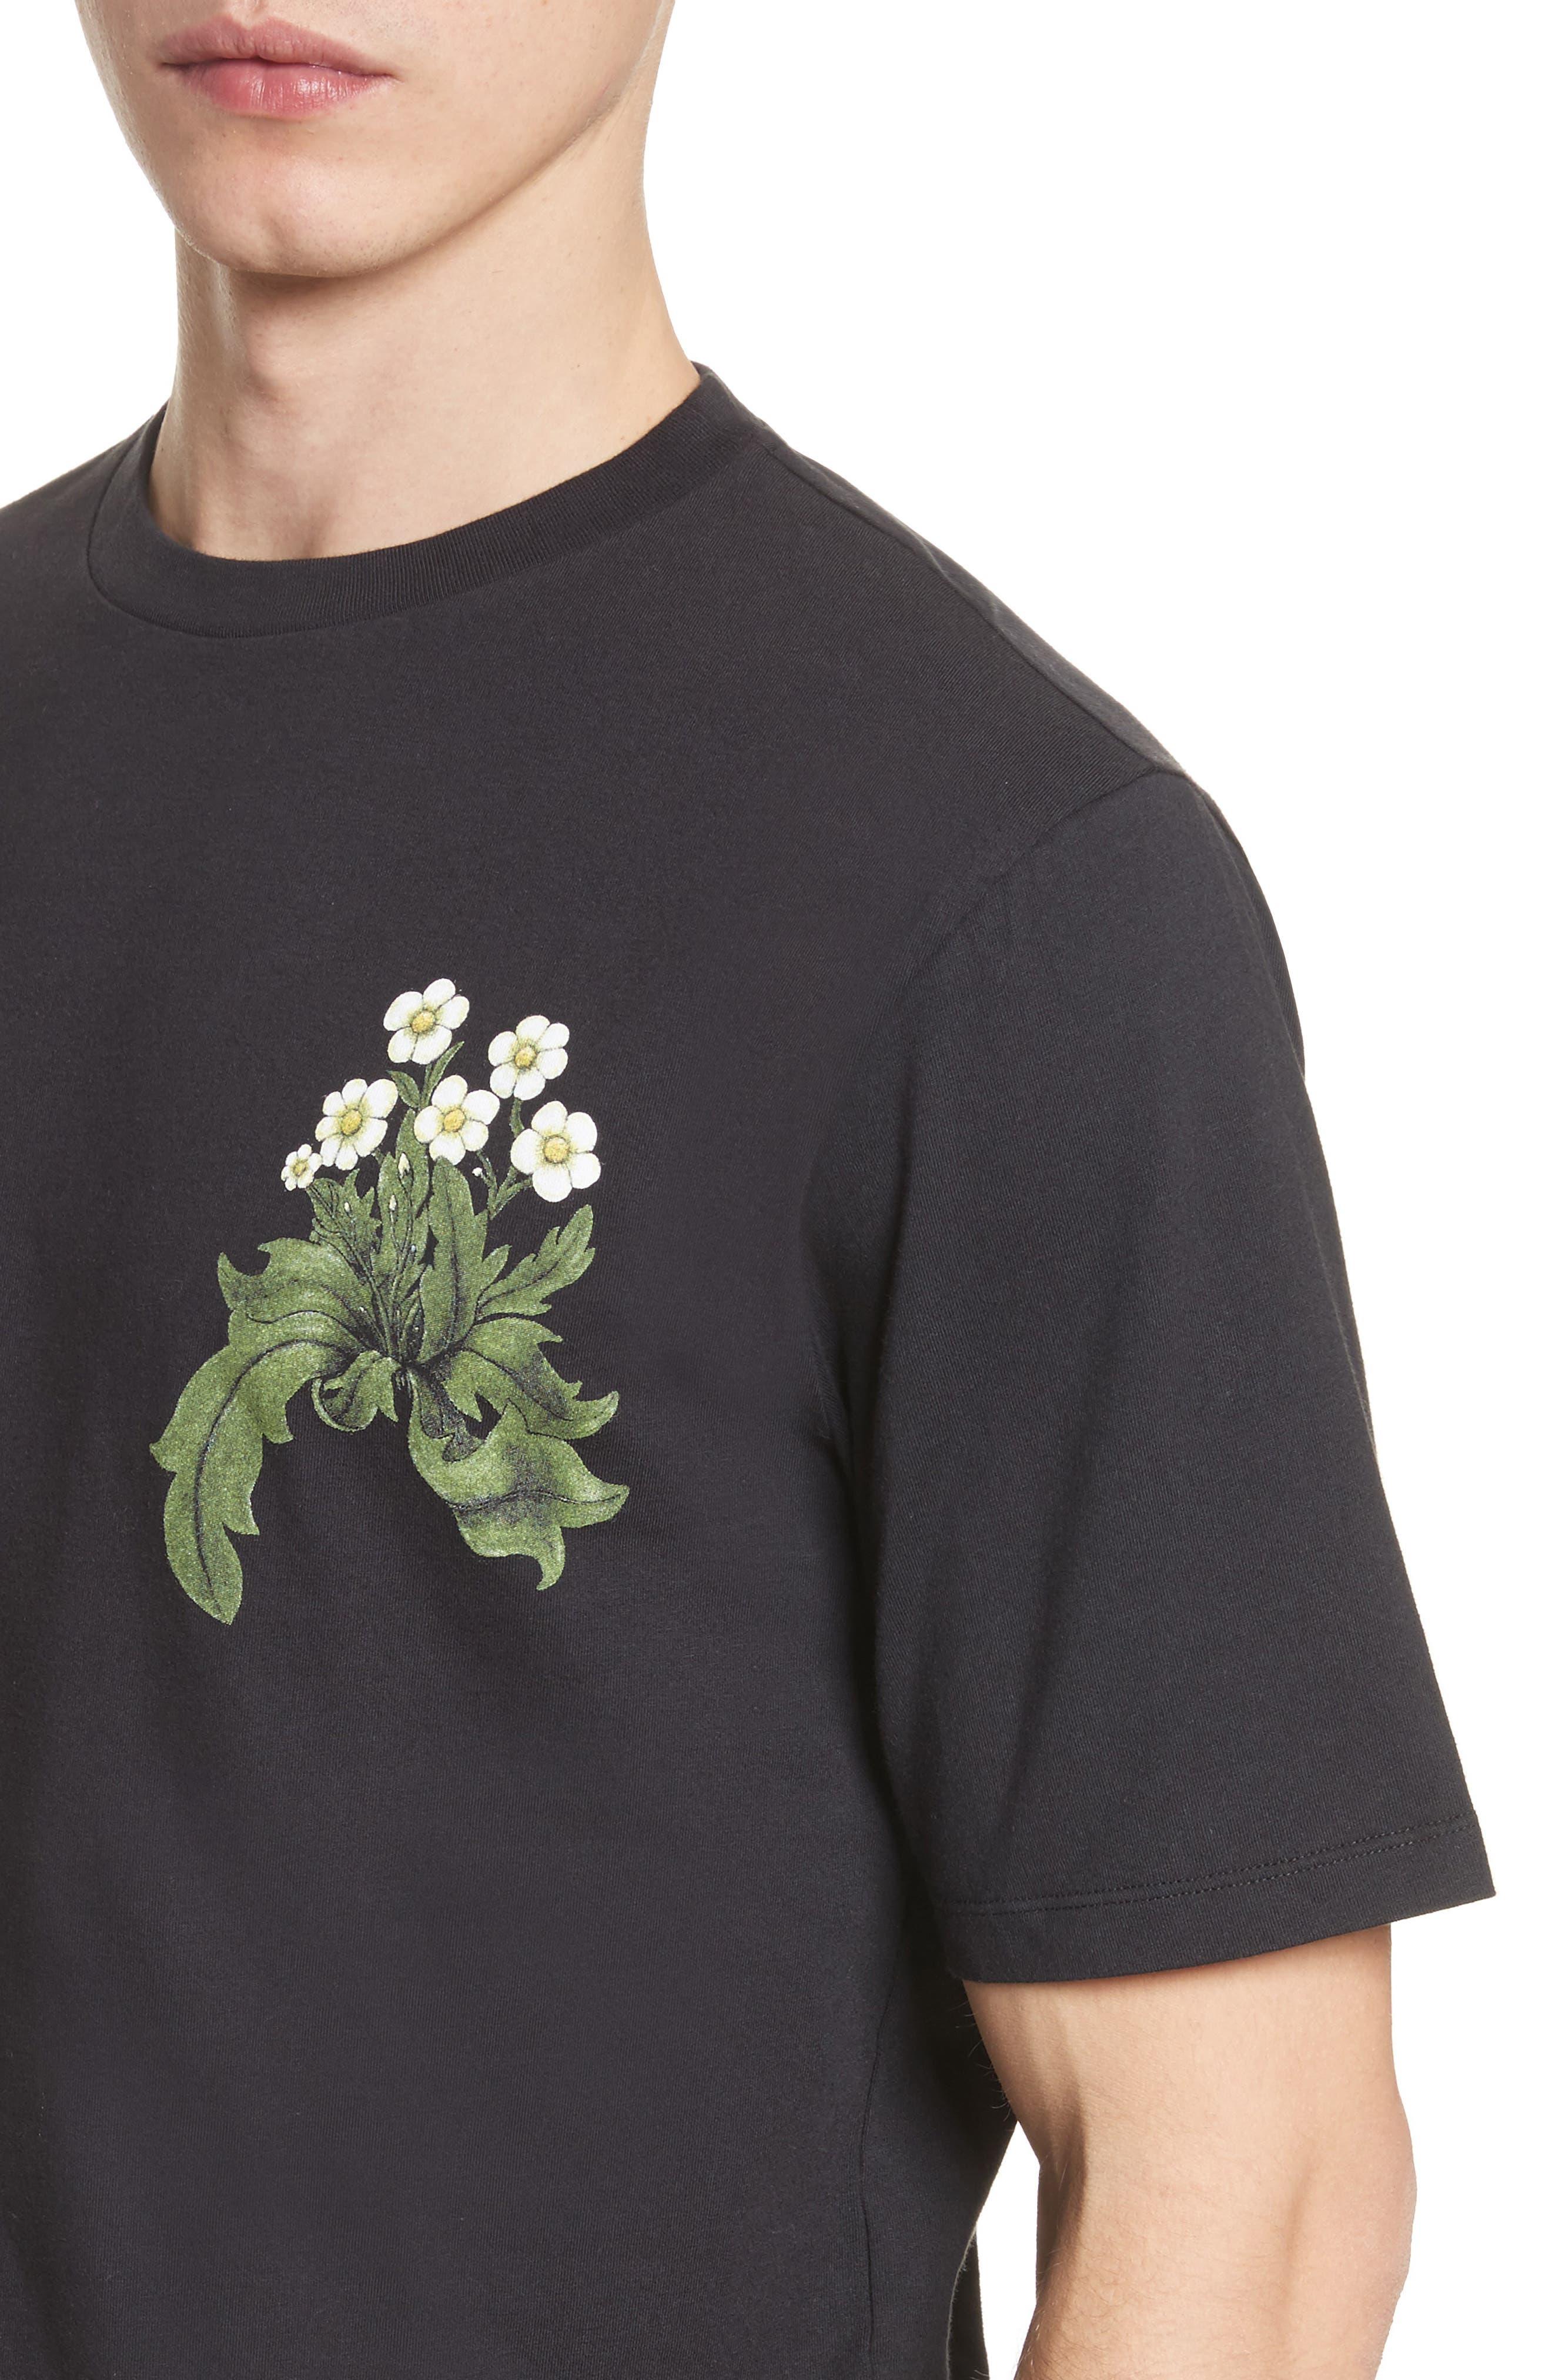 Loewe & Co. Graphic T-Shirt,                             Alternate thumbnail 4, color,                             001